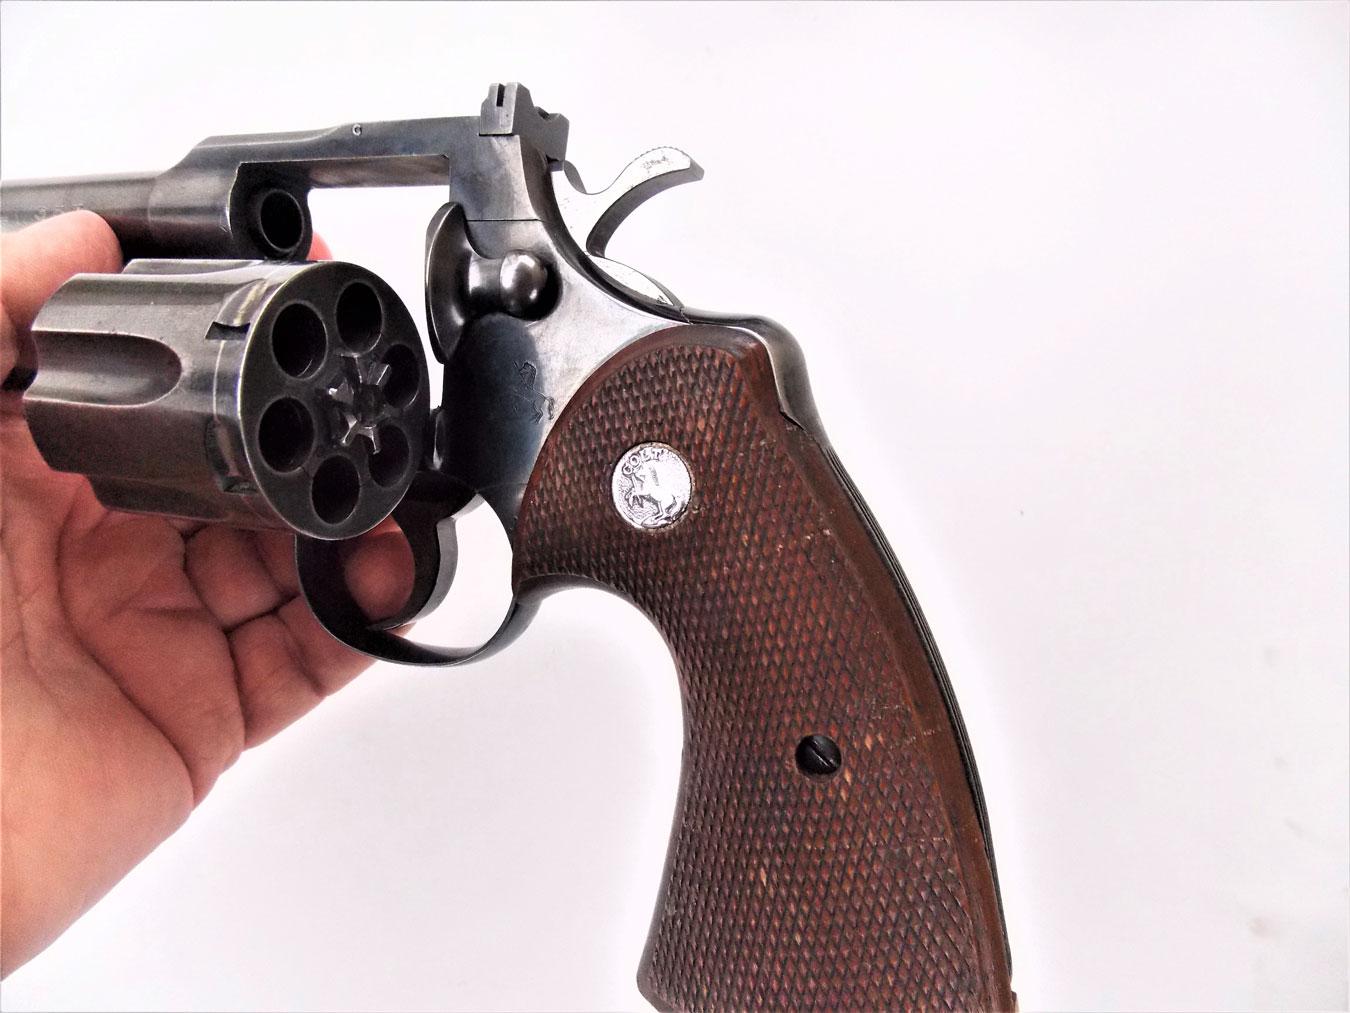 Colt .357 magnum revolver  with cylinder open